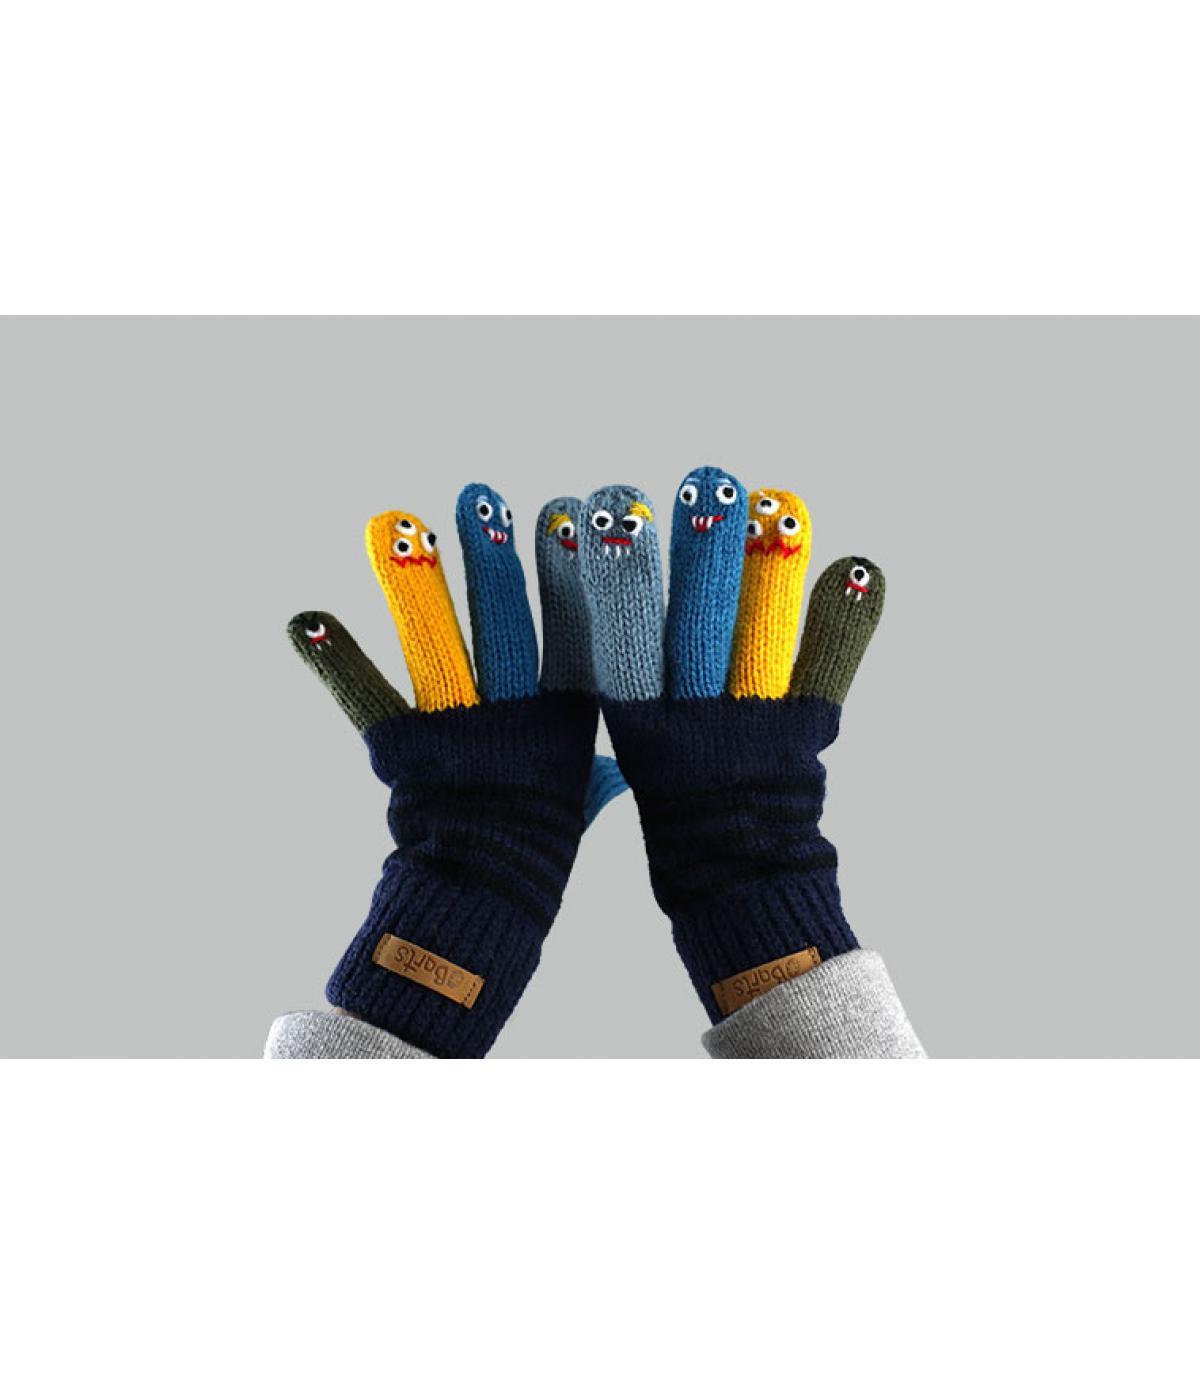 guanti da burattino da bambino